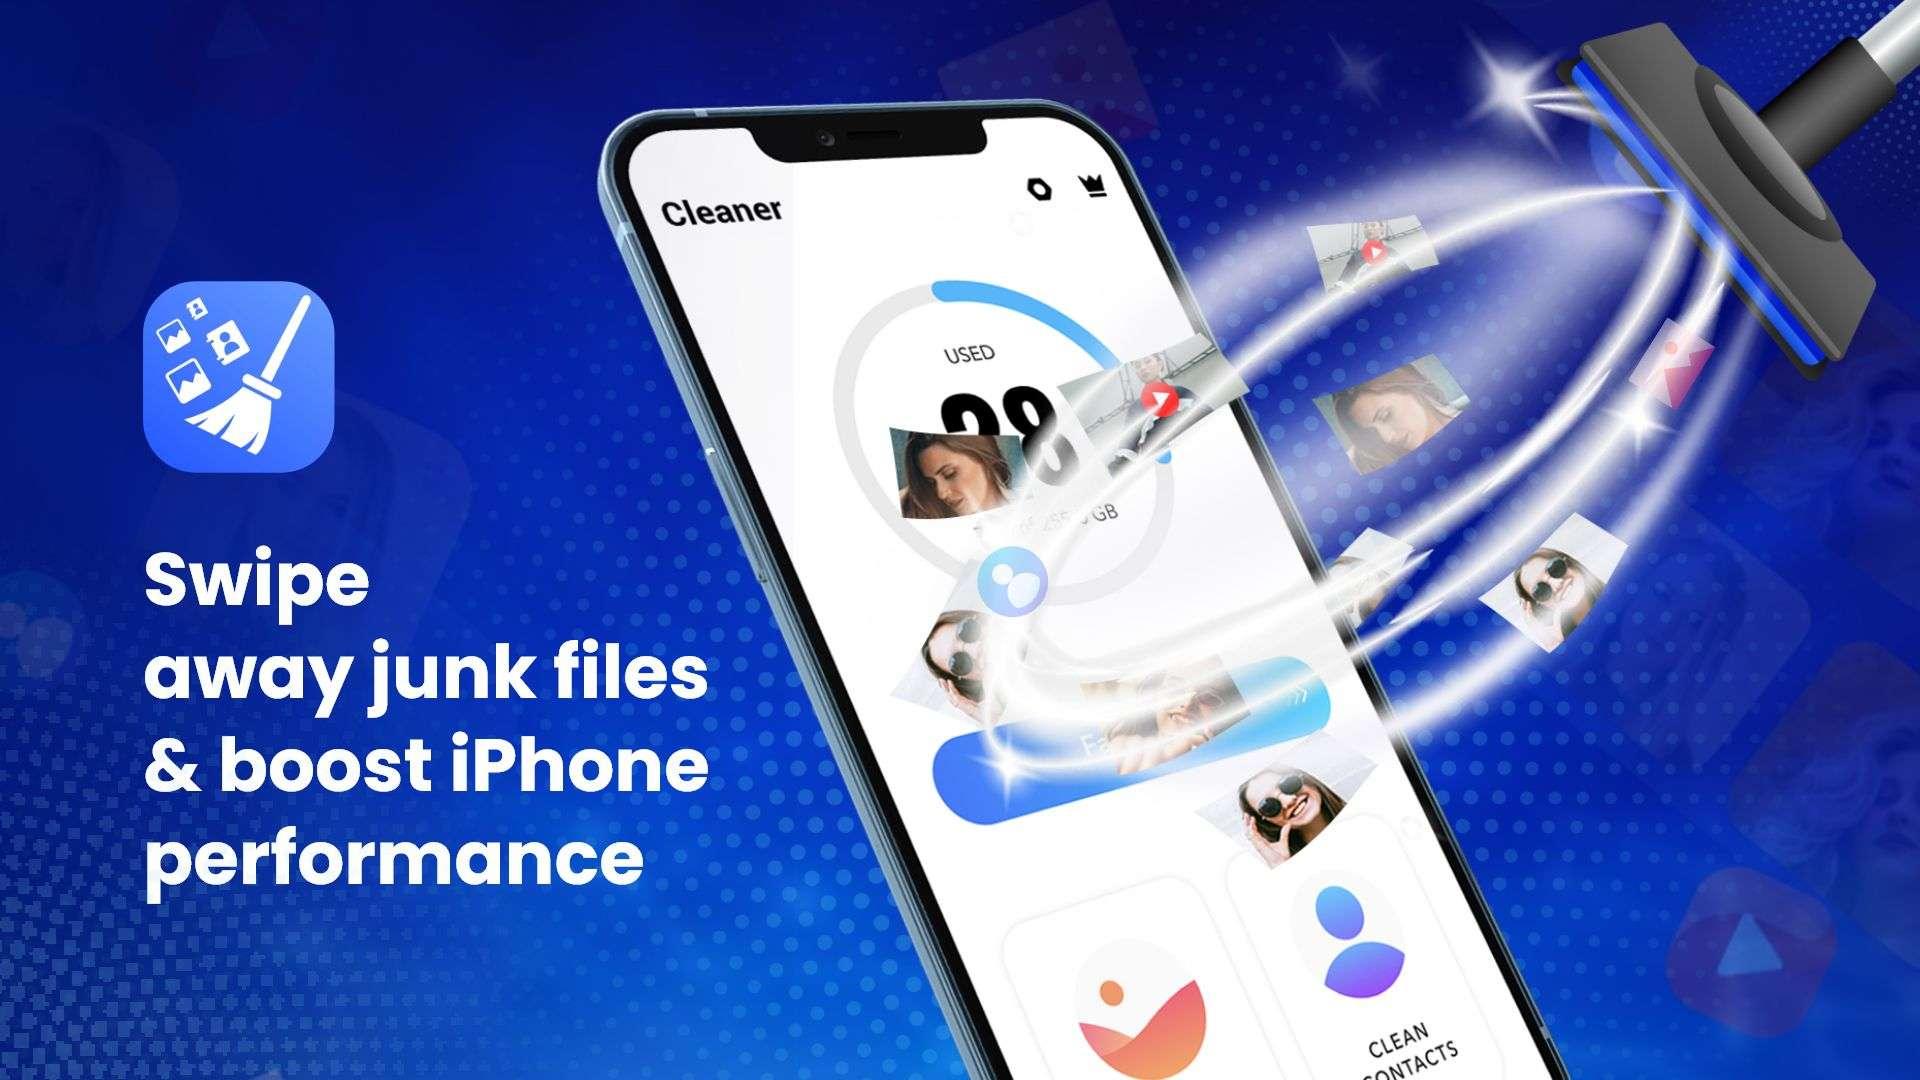 swipe away junk files & boost iPhone performance